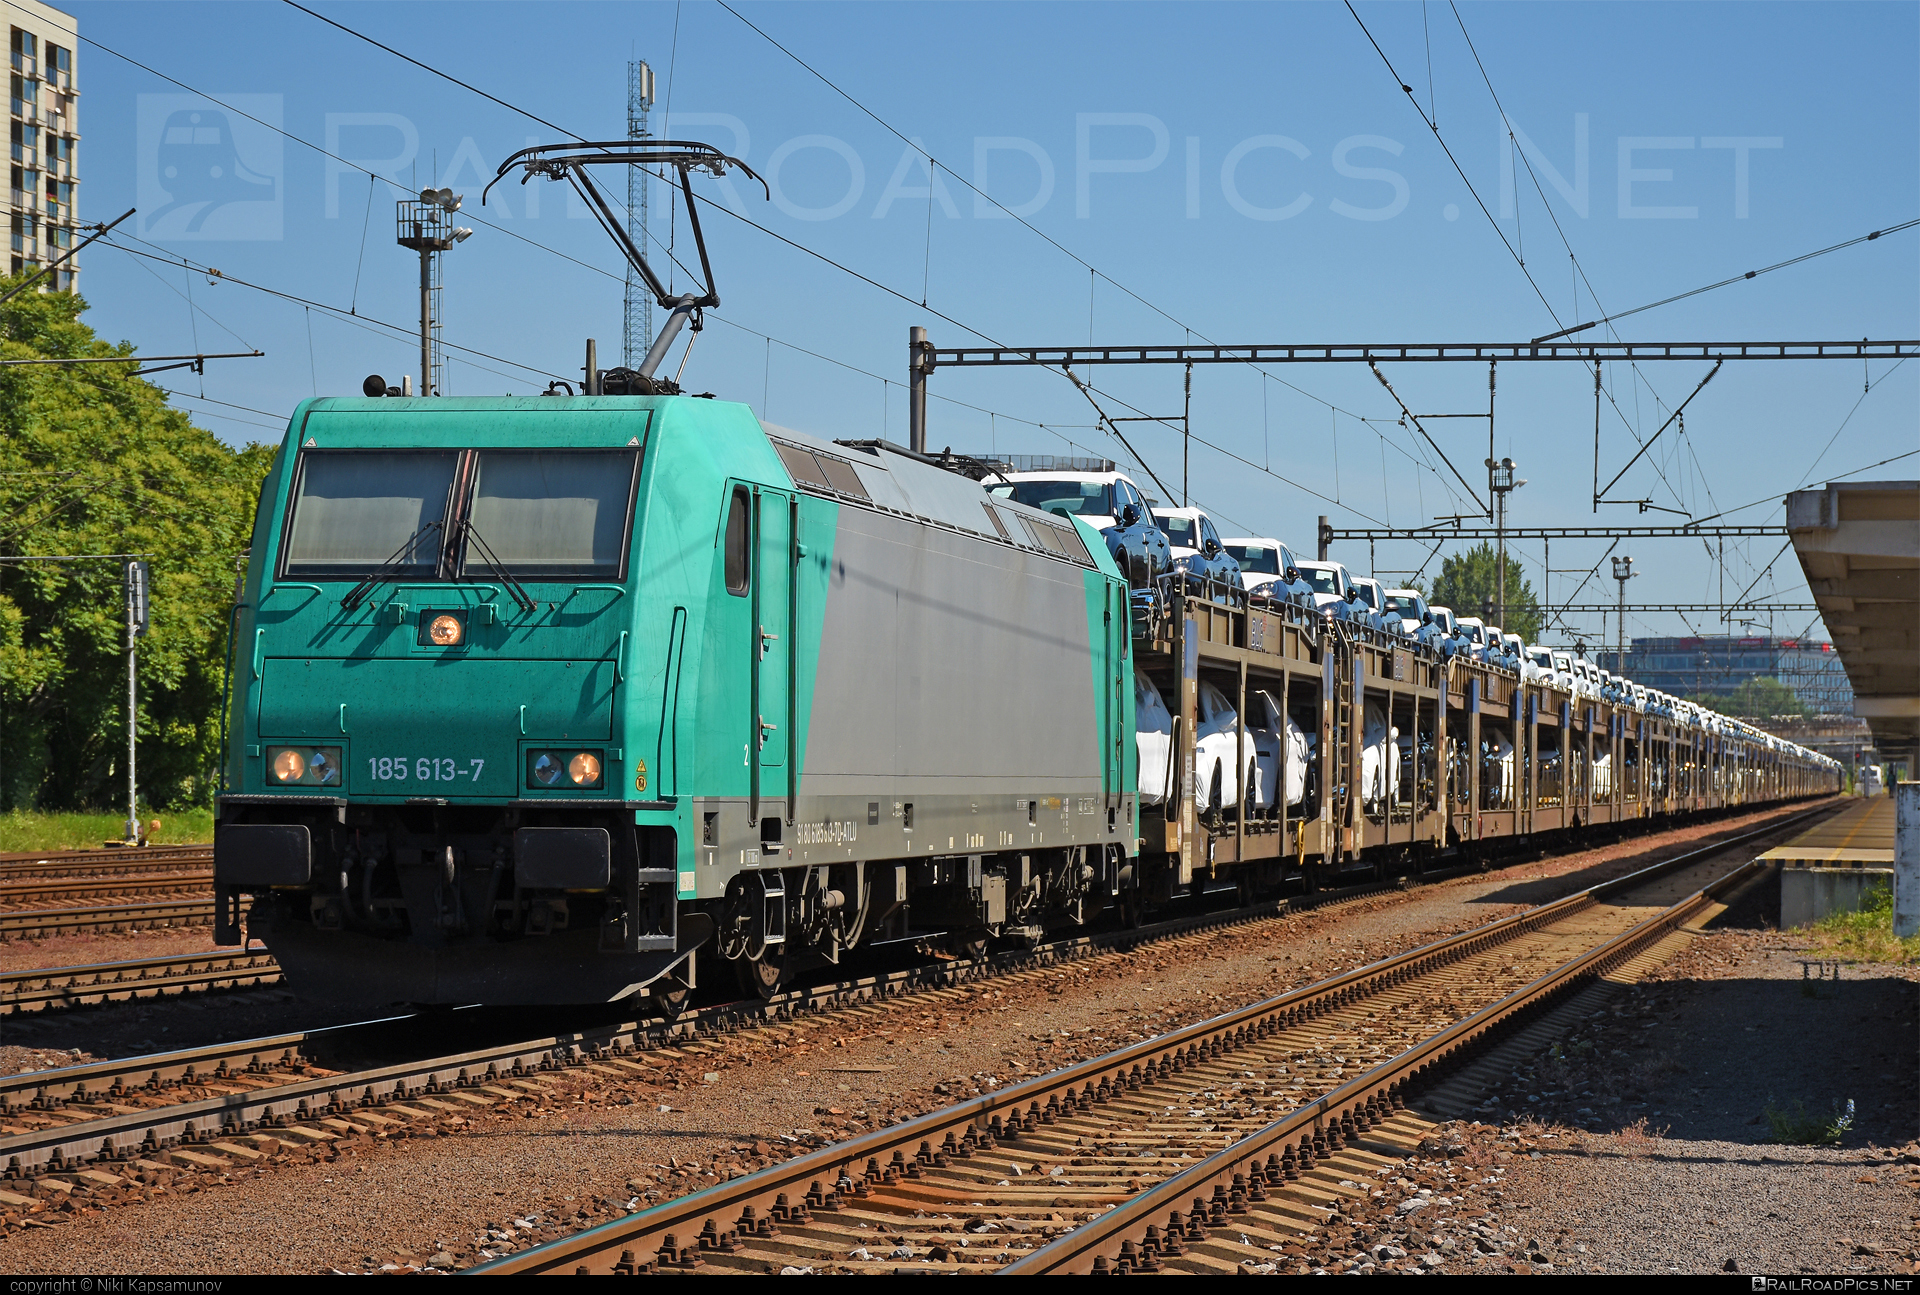 Bombardier TRAXX F140 AC2 - 185 613-7 operated by ecco-rail GmbH #alphatrainsluxembourg #bombardier #bombardiertraxx #carcarrierwagon #eccorail #eccorailgmbh #traxx #traxxf140 #traxxf140ac #traxxf140ac2